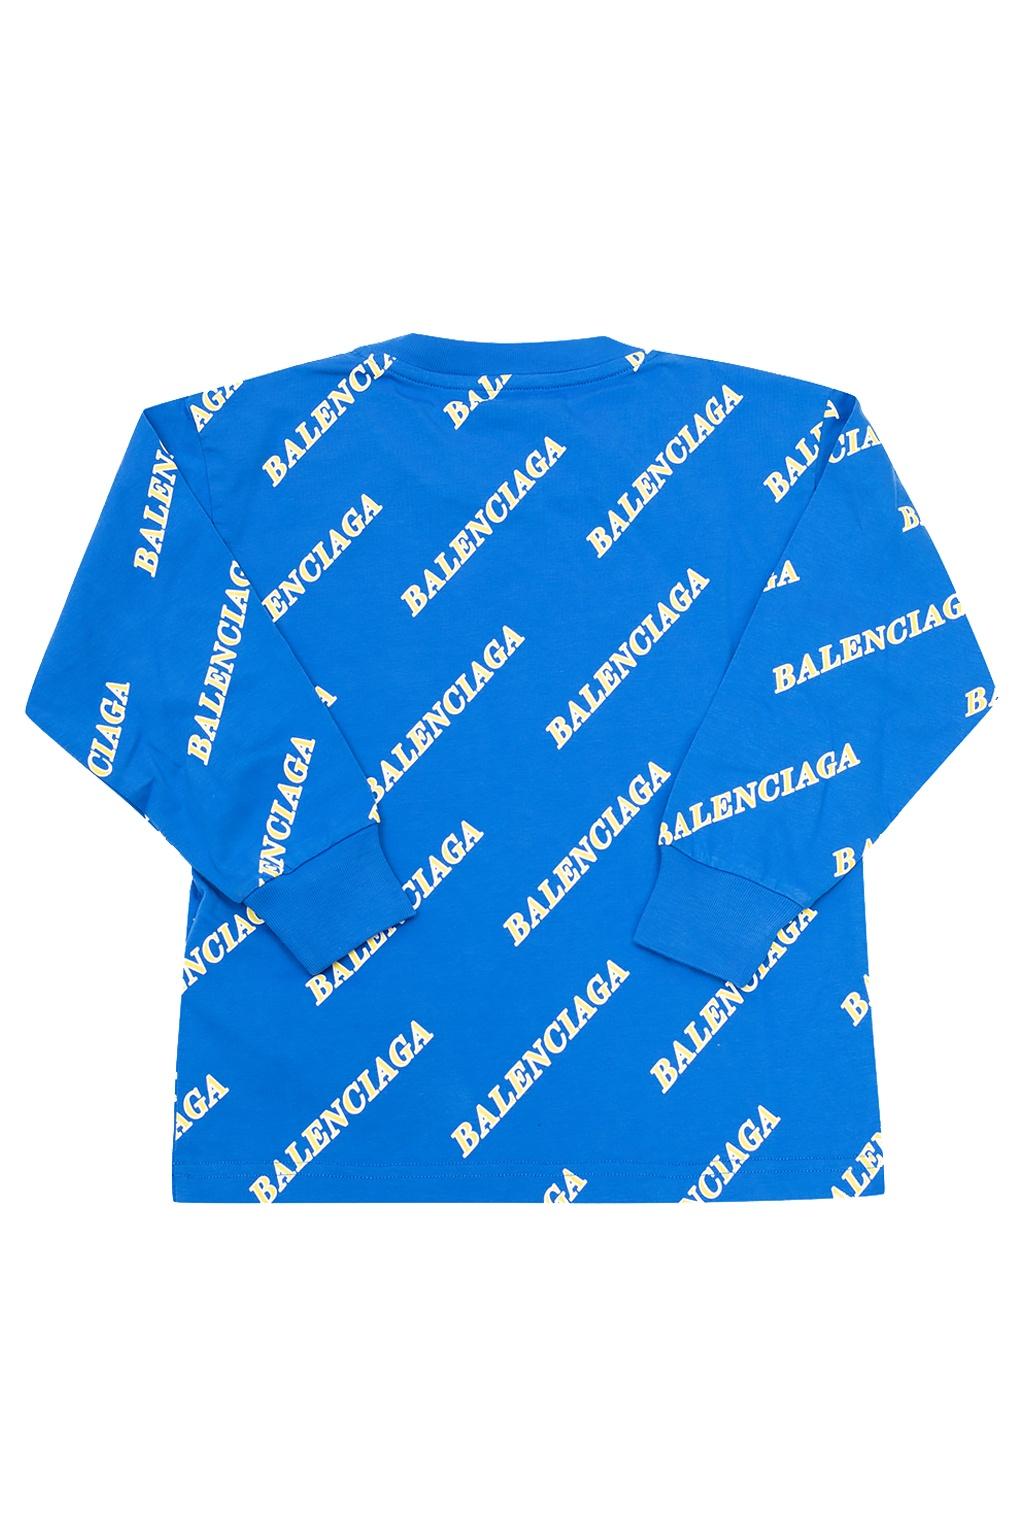 Balenciaga Kids Long-sleeved T-shirt with logo